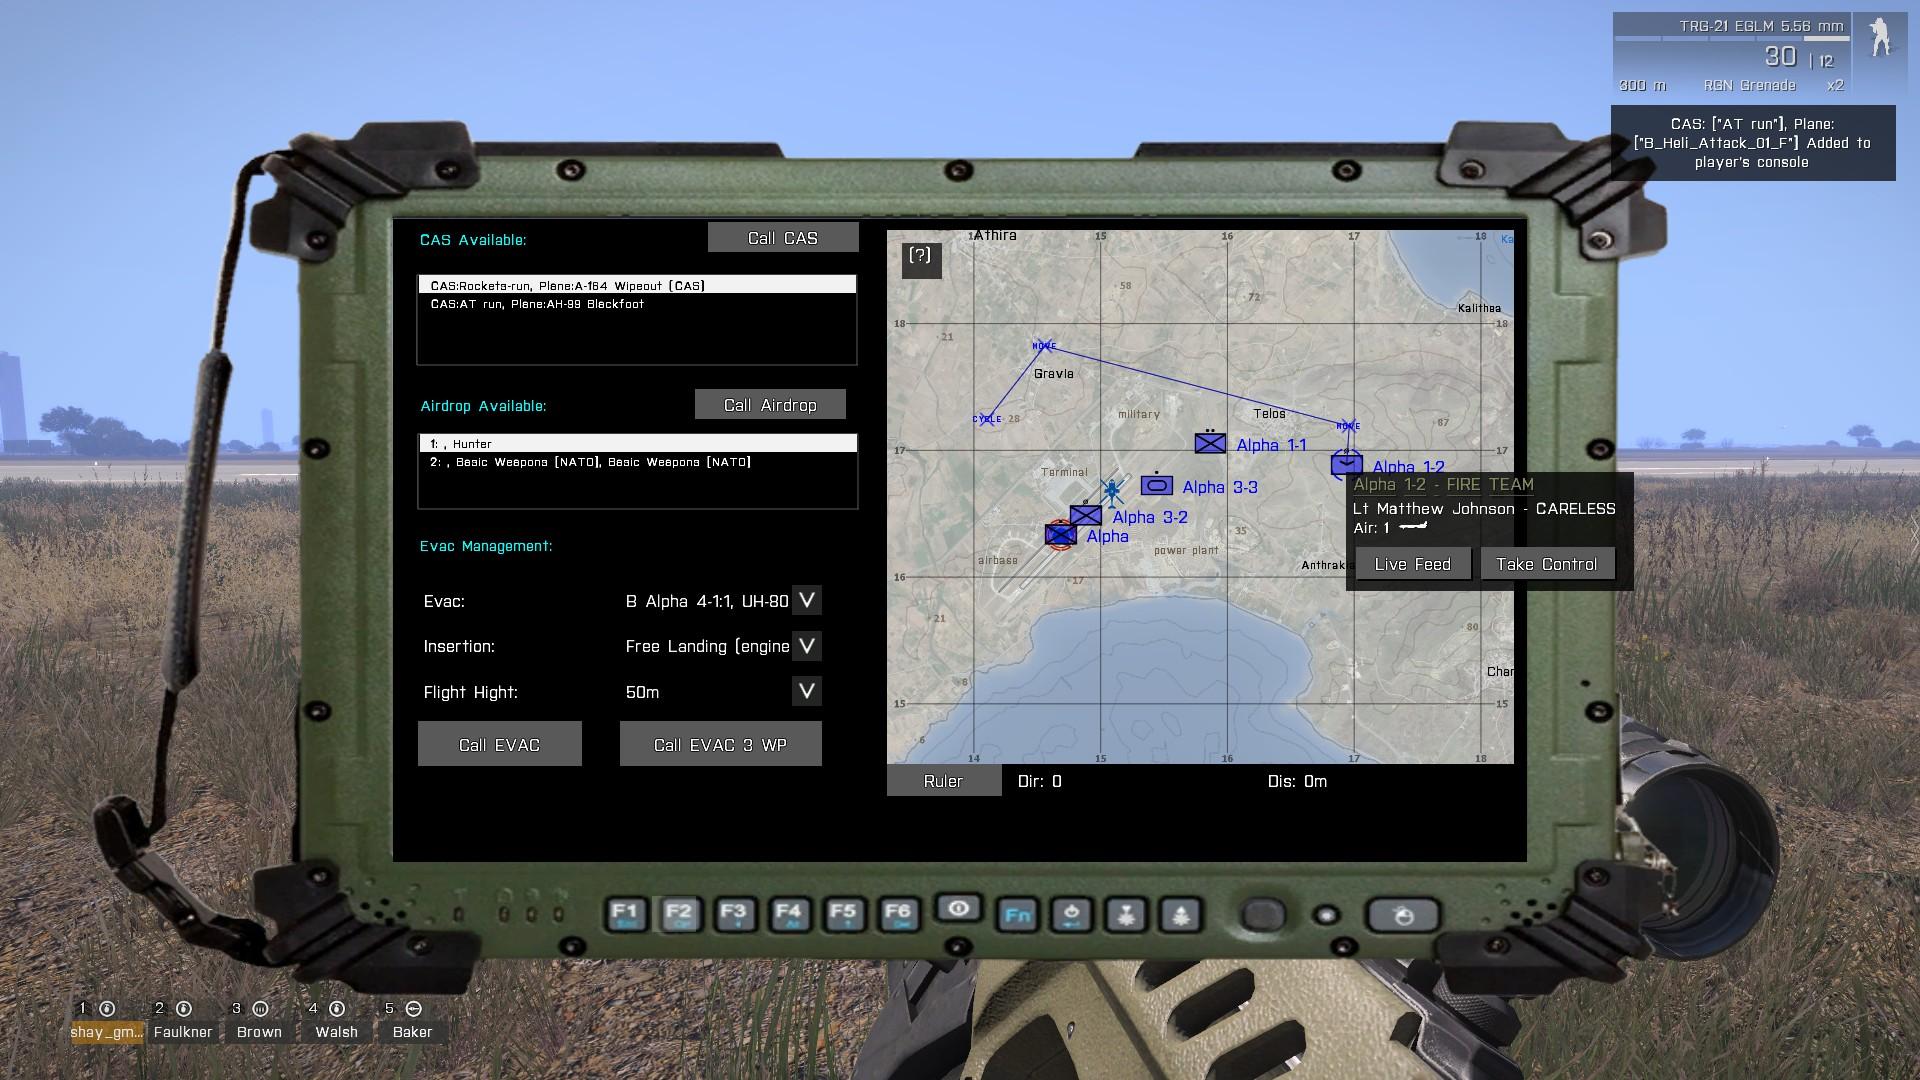 Commander Console Main | MCCSandbox Wiki | FANDOM powered by